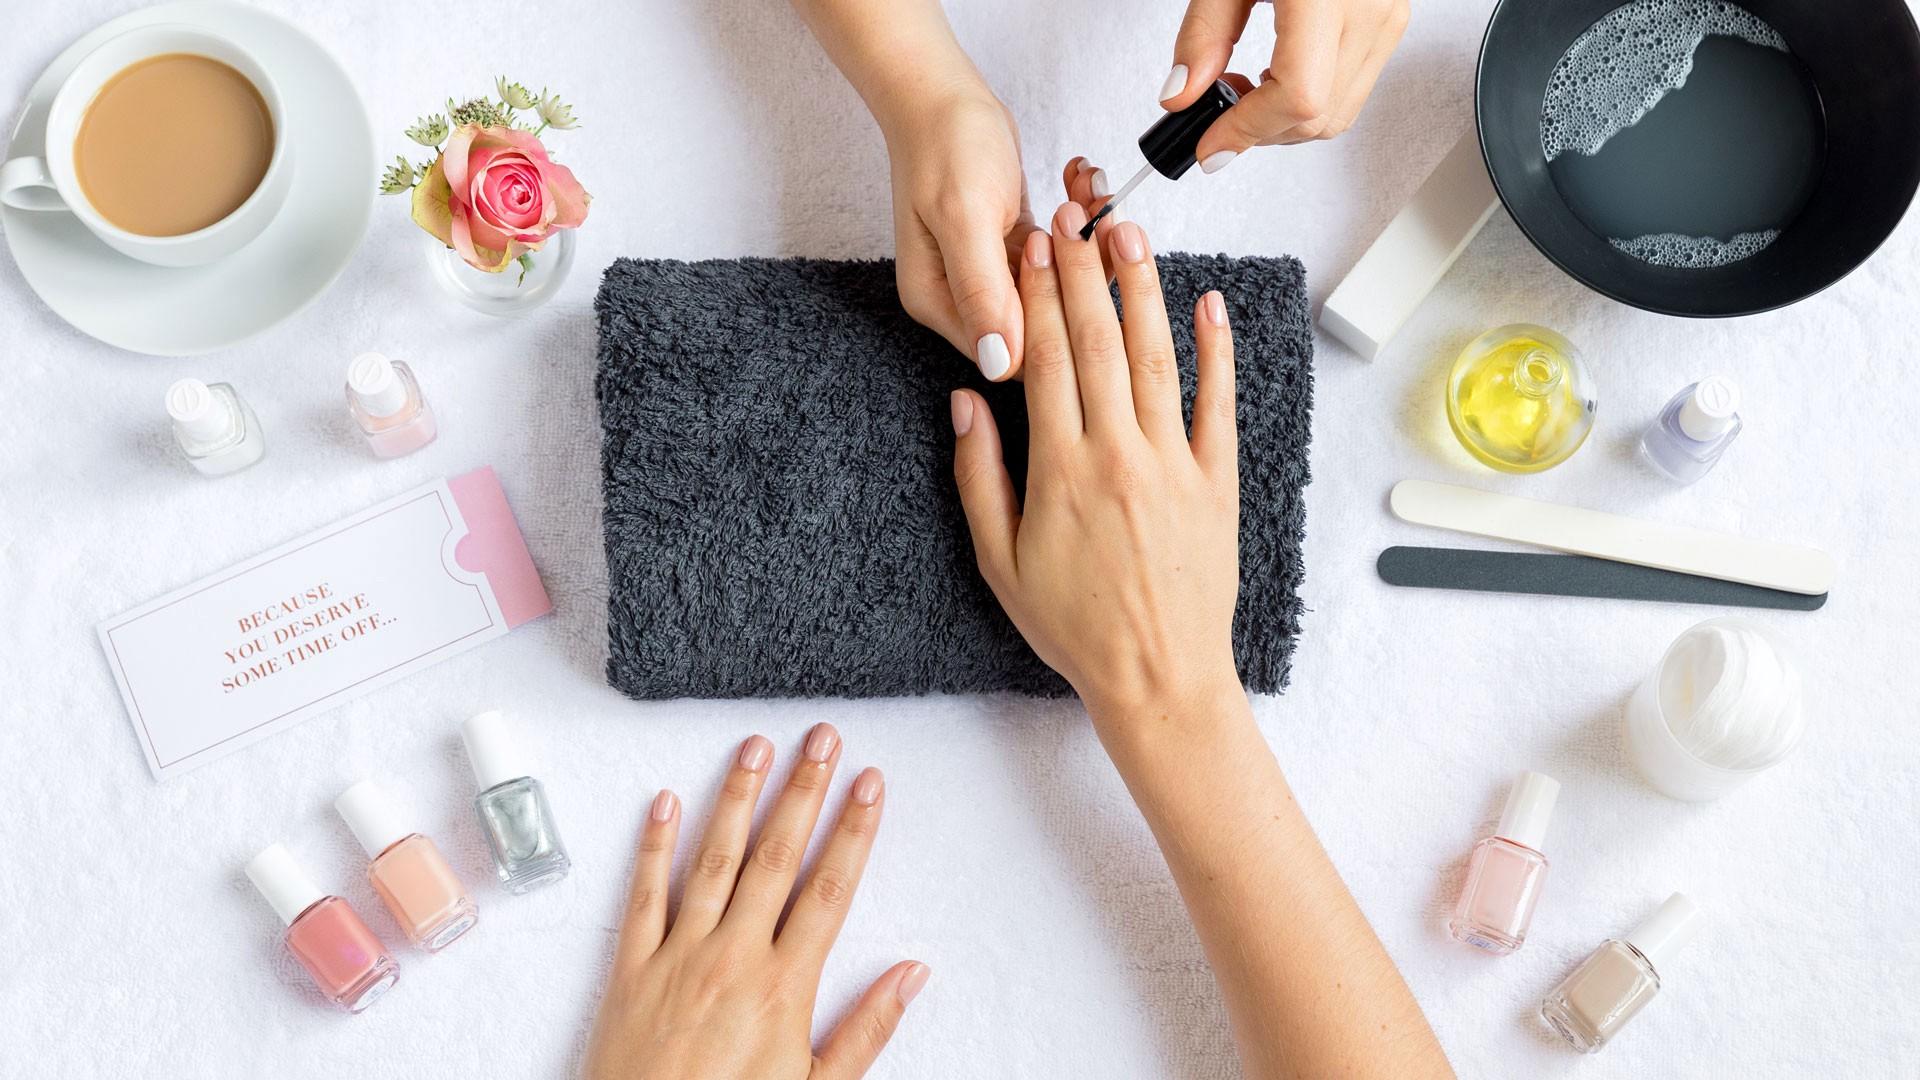 Kosmetika A Krasa Part 2